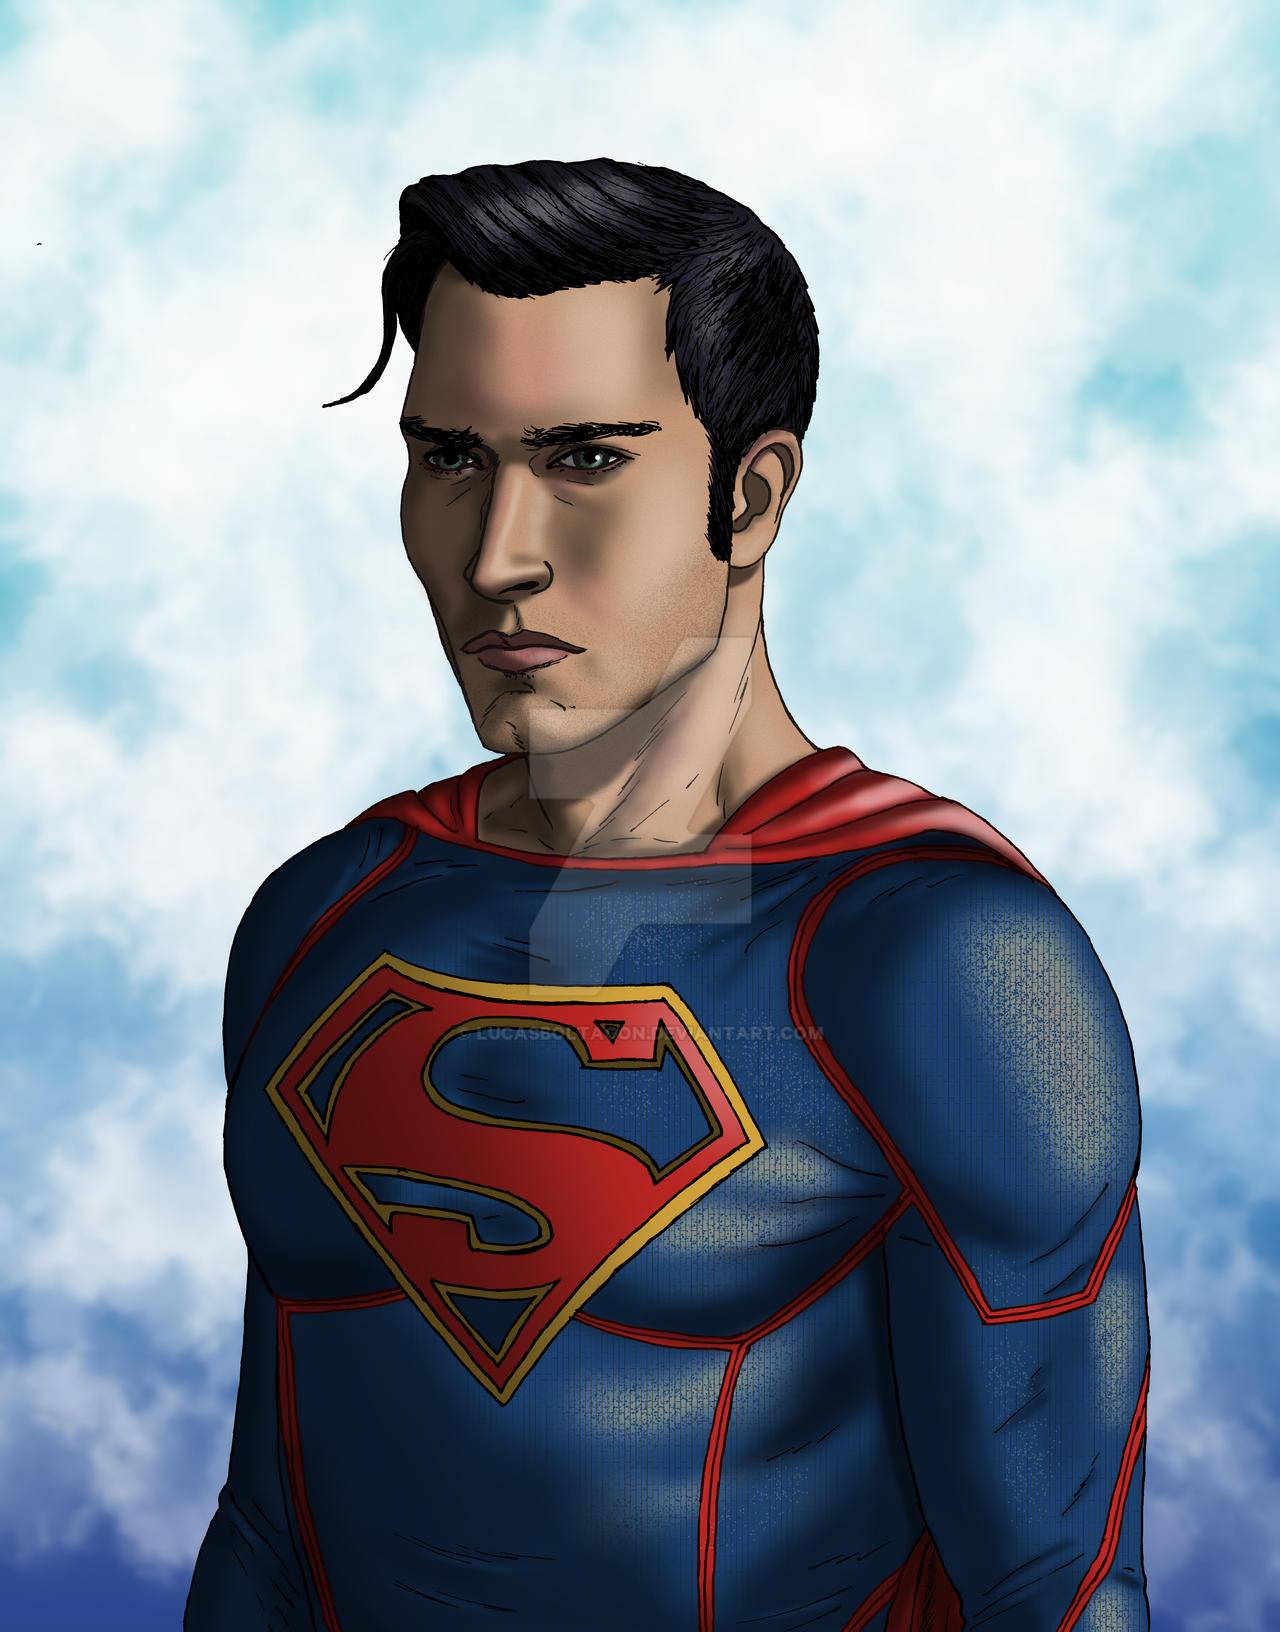 http://img09.deviantart.net/6d70/i/2016/169/f/0/superman_tyler_hoechlin_16_06_2016_by_lucasboltagon-da6mi4v.jpg